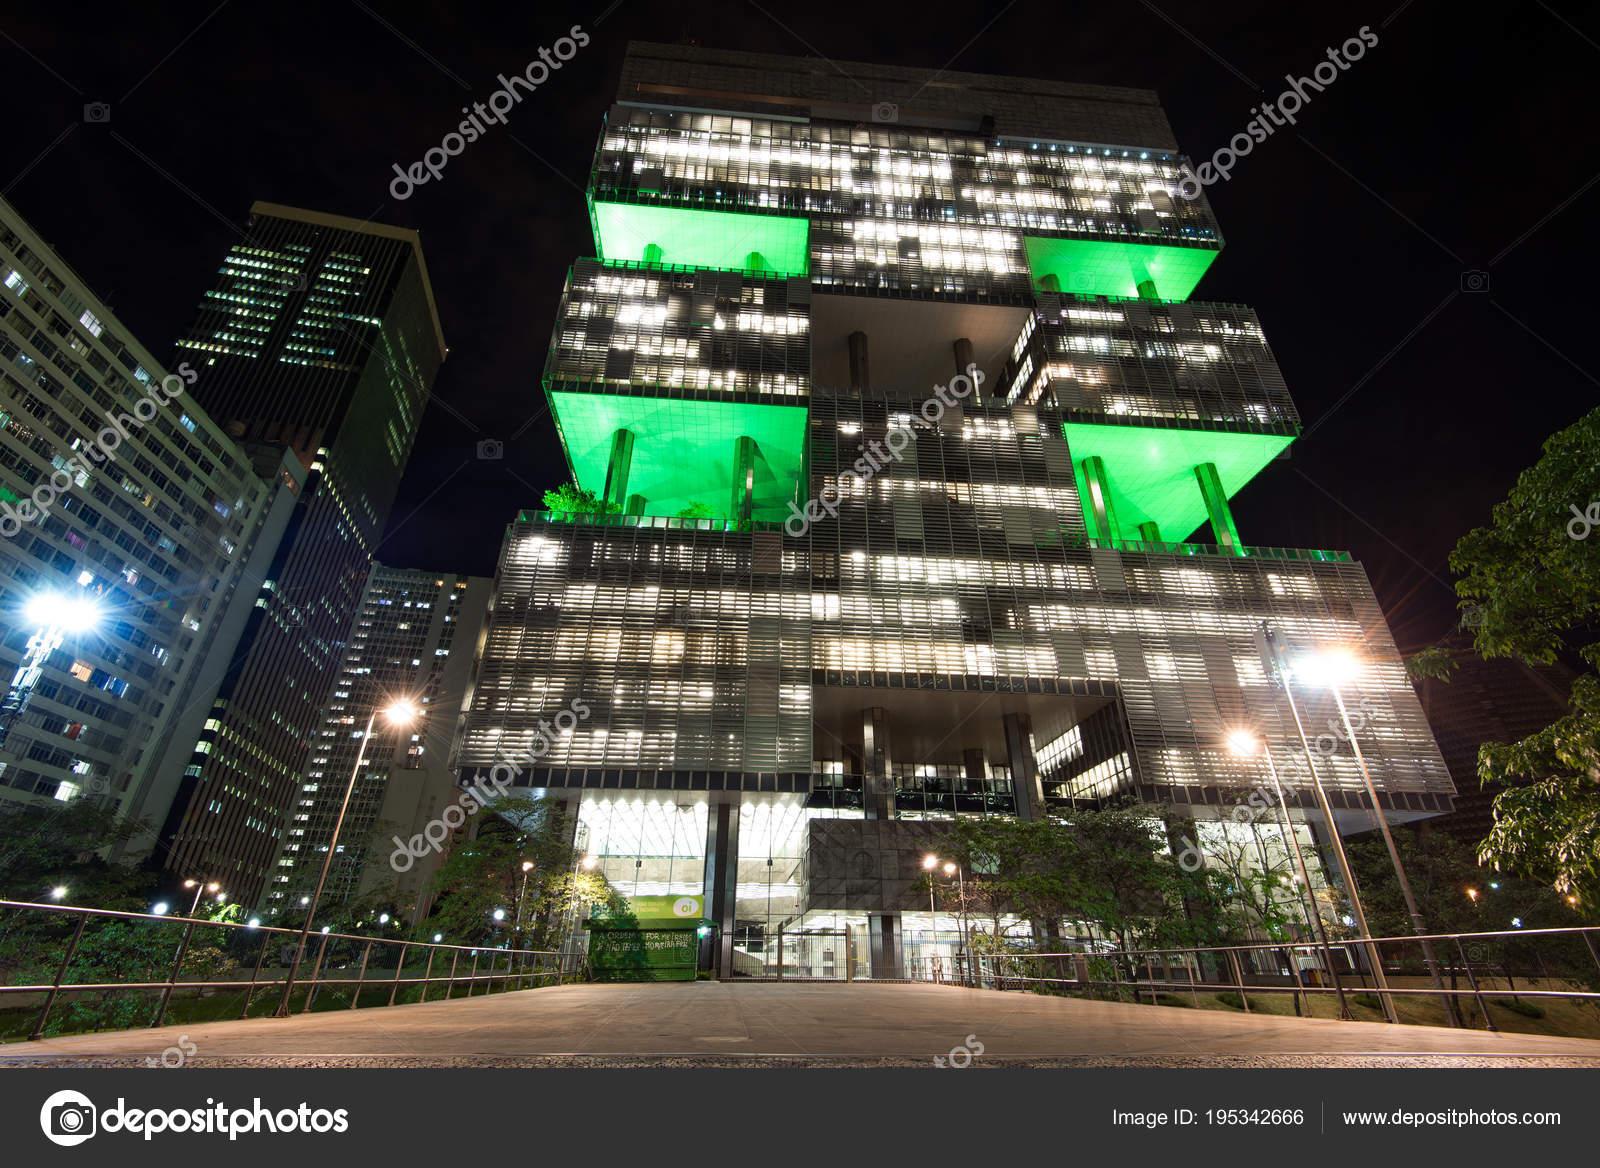 Rio Janeiro Brazilië April 2018 Facade Van Petrobras Bedrijf Bouwen ...